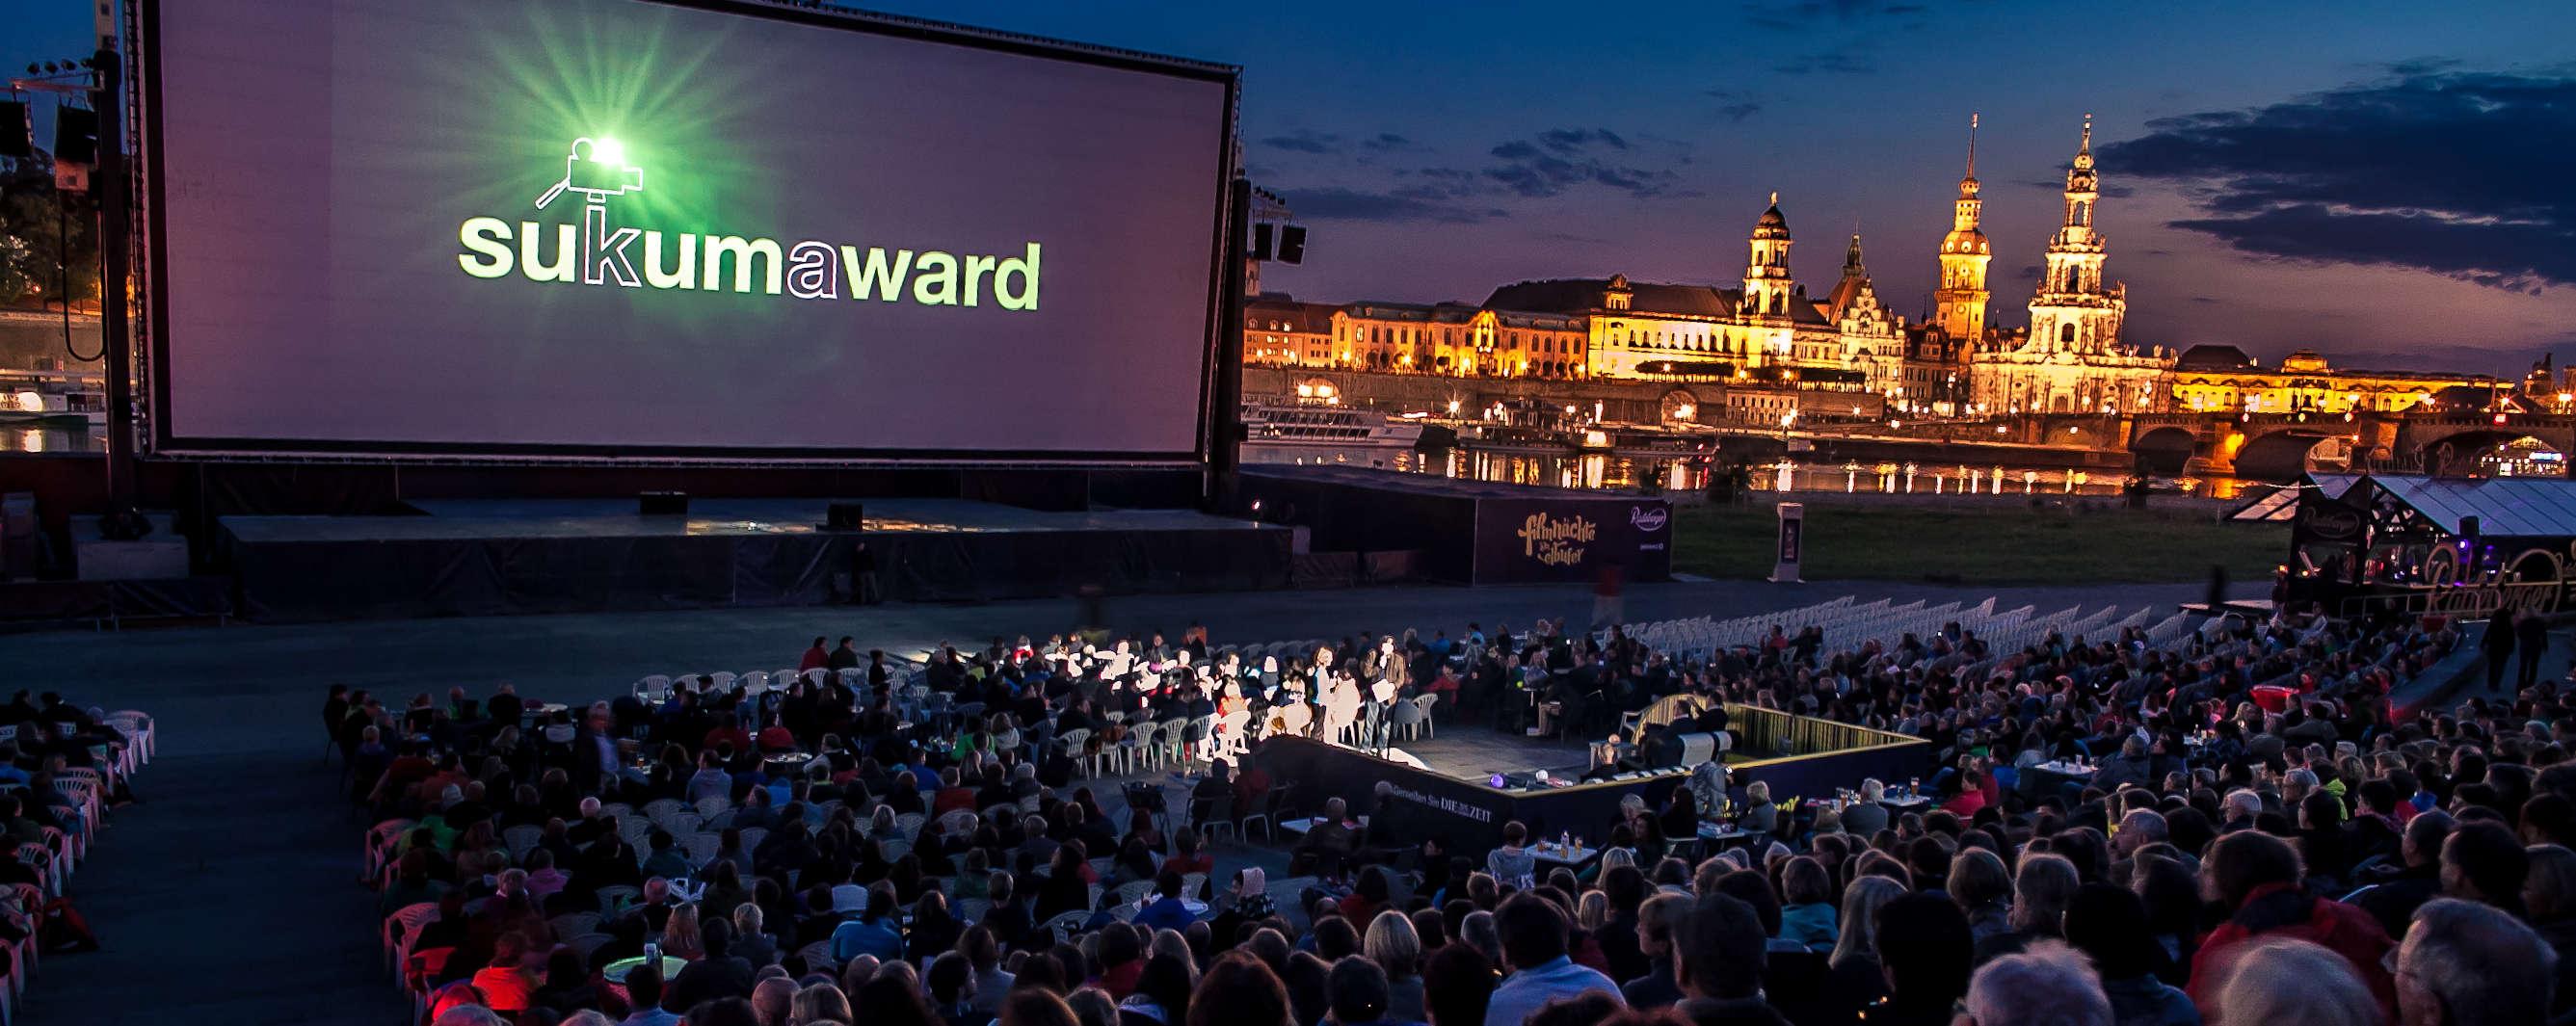 Filmnächte am Elbufer in Dresden